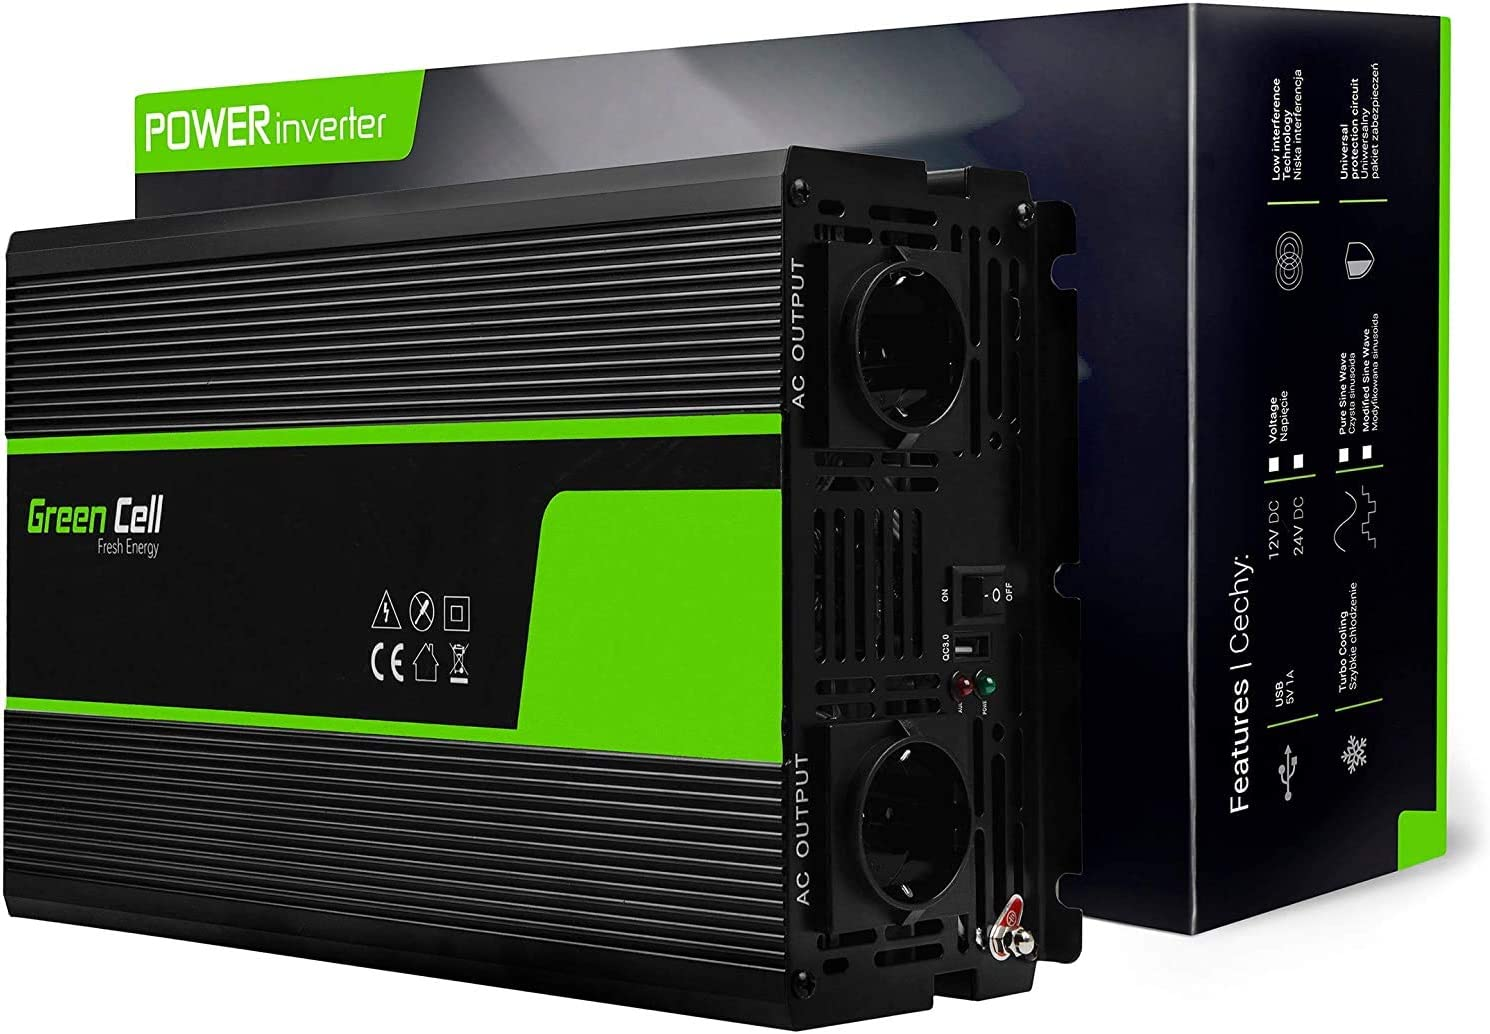 Green Cell® 3000W/6000W Onda sinusoidal Pura Inversor de Corriente Power Inverter DC 12V AC 220V, Transformador de Voltaje para Coche con Puerto USB y Pinzas de conexión a batería